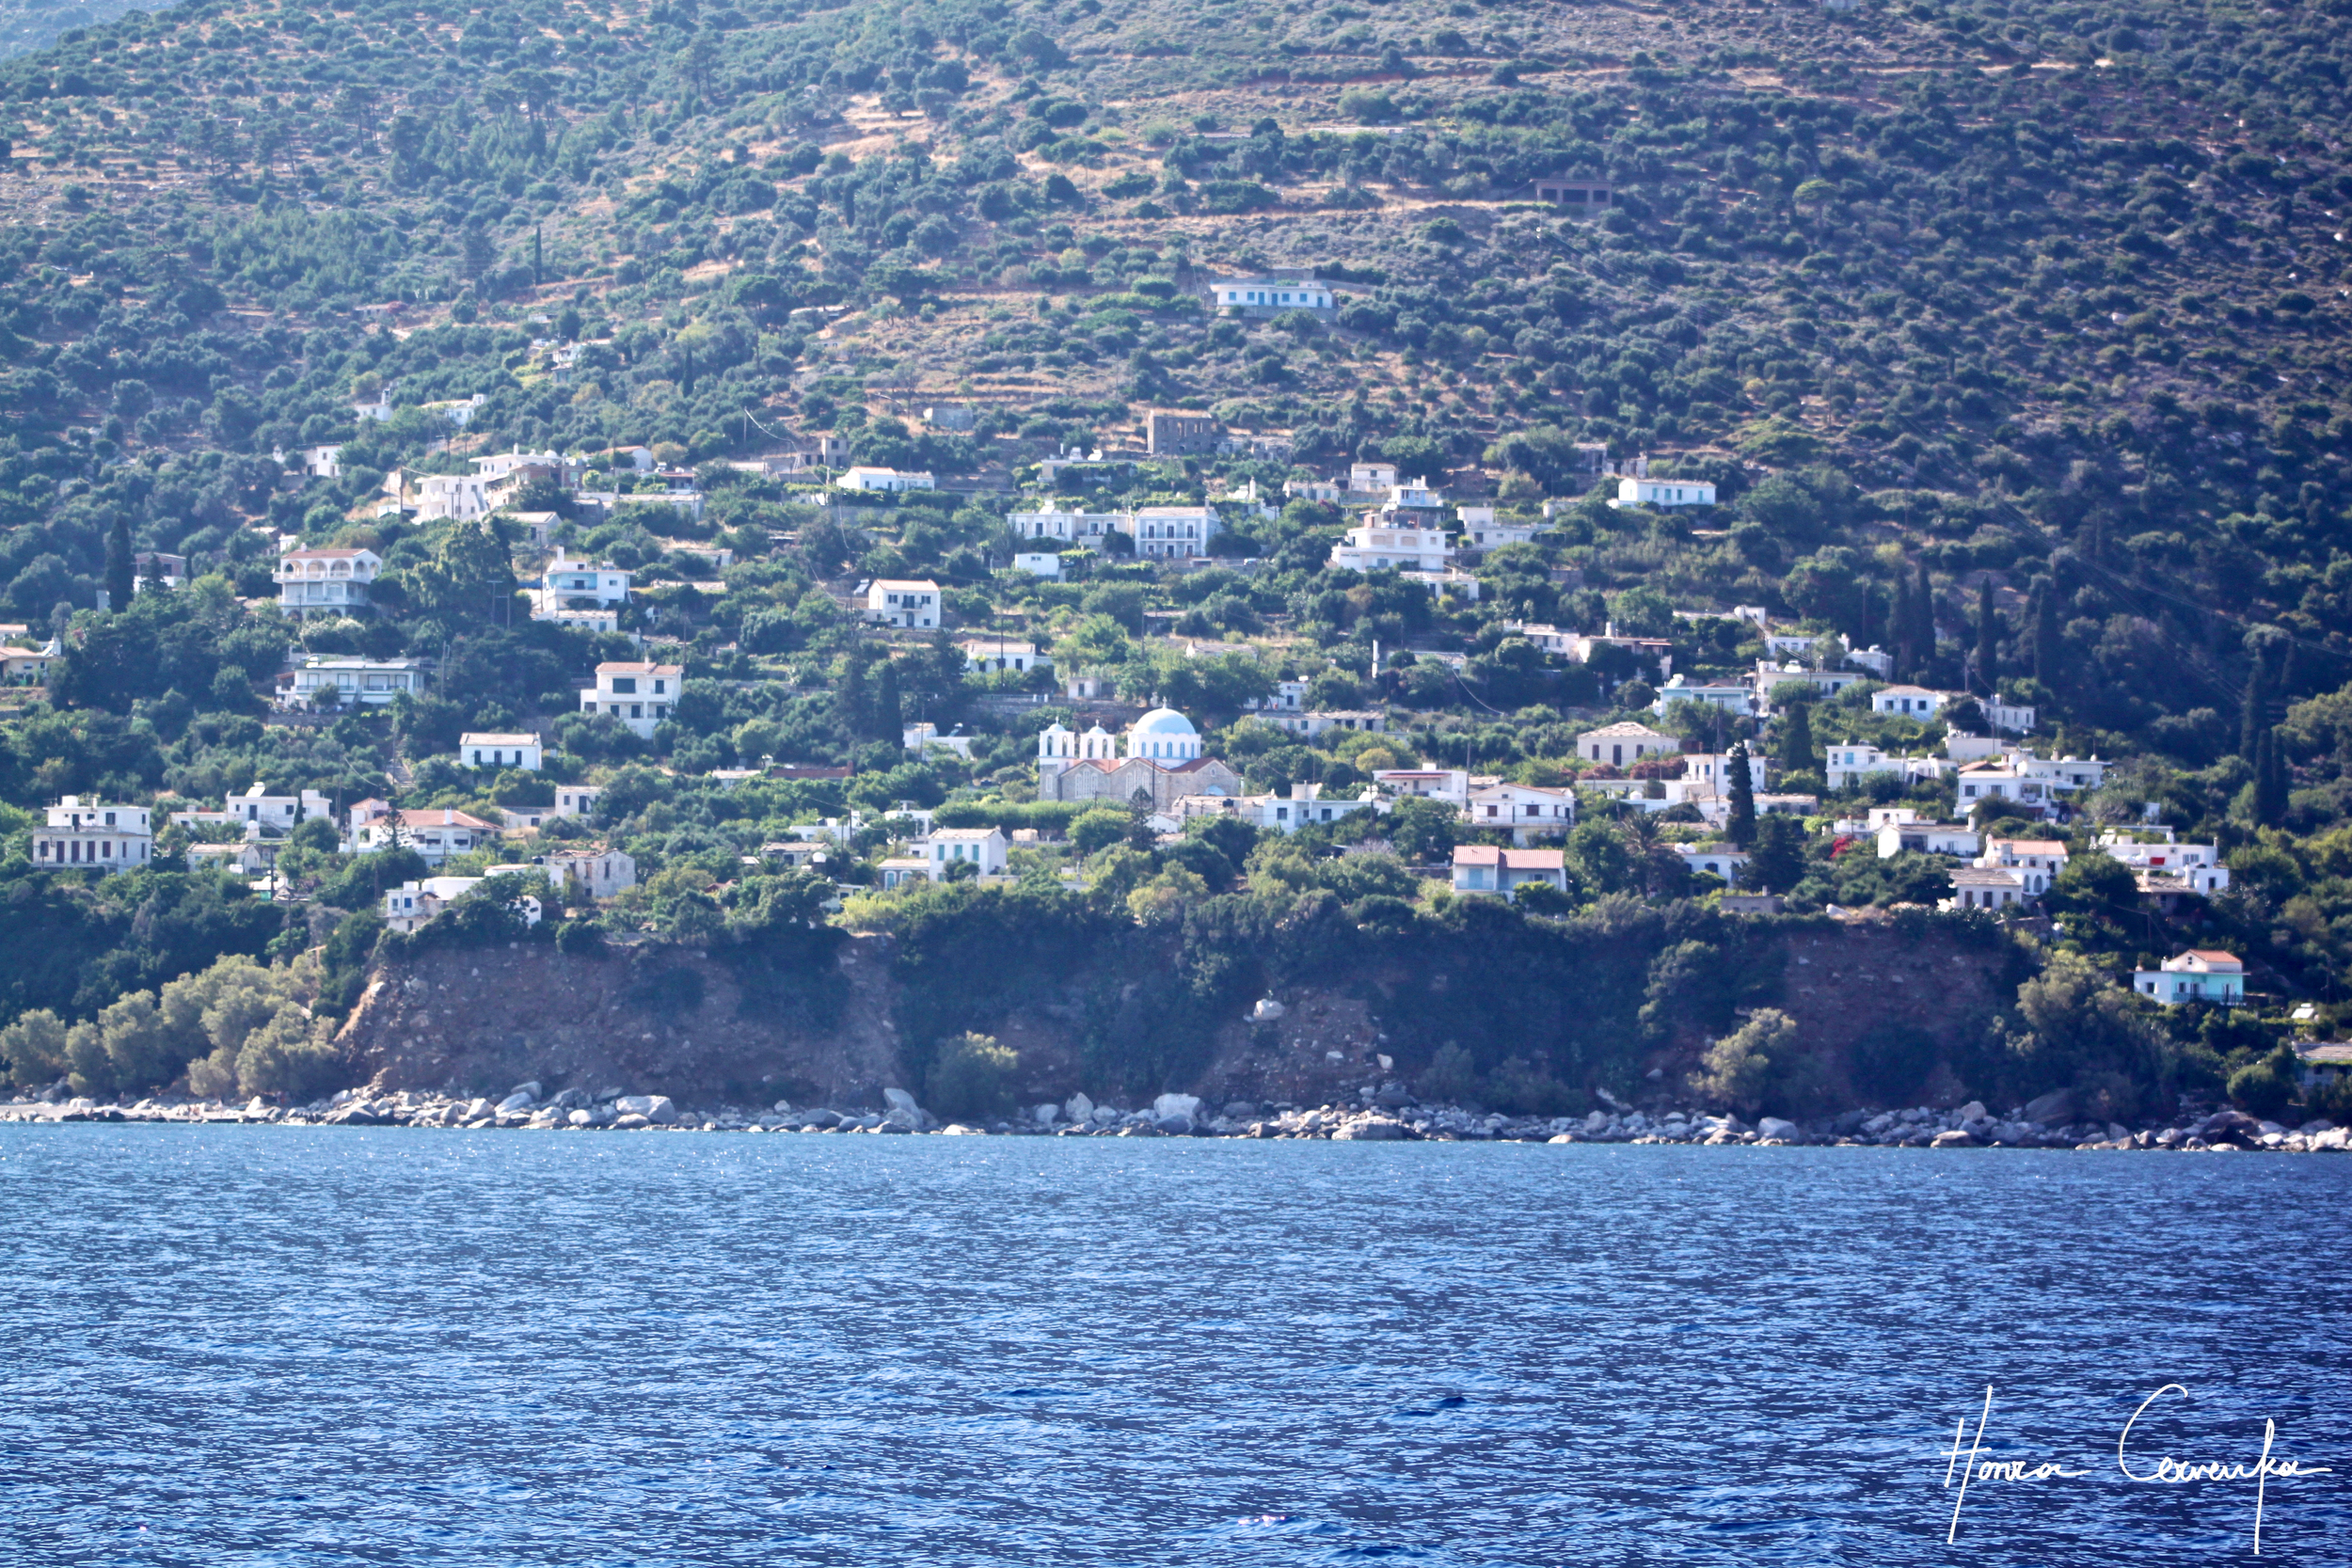 Ikaria-Kalomeria-Greece-2013-Honza-Cervenka